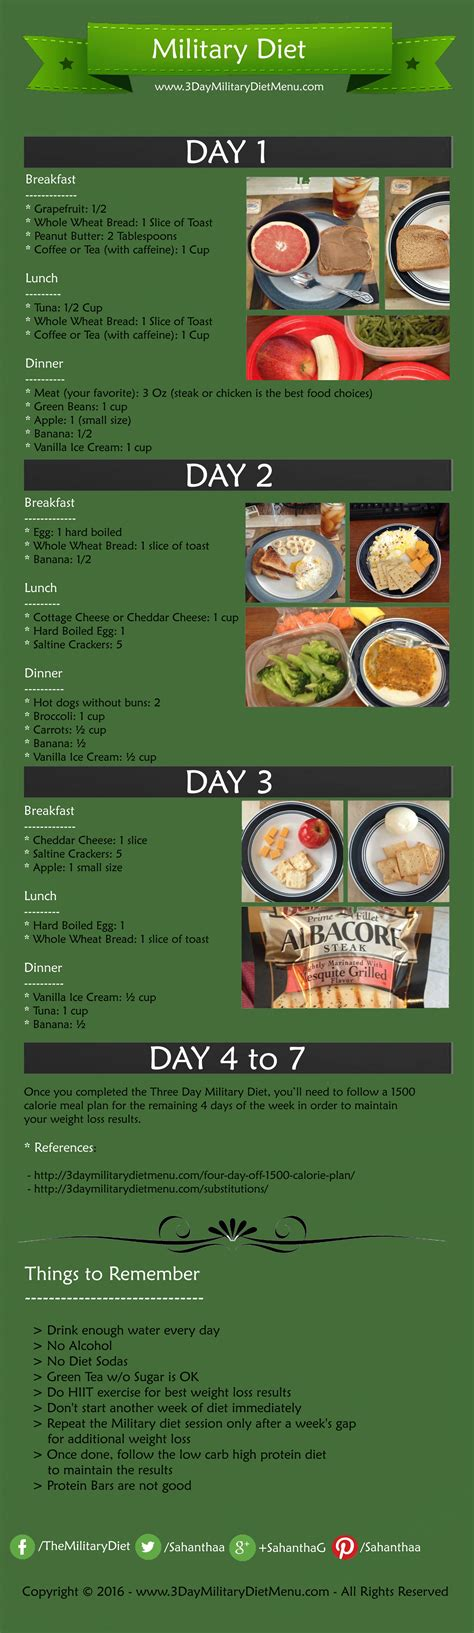 weight loss 2 days 7 day diet 3 days weight loss diet 4 days